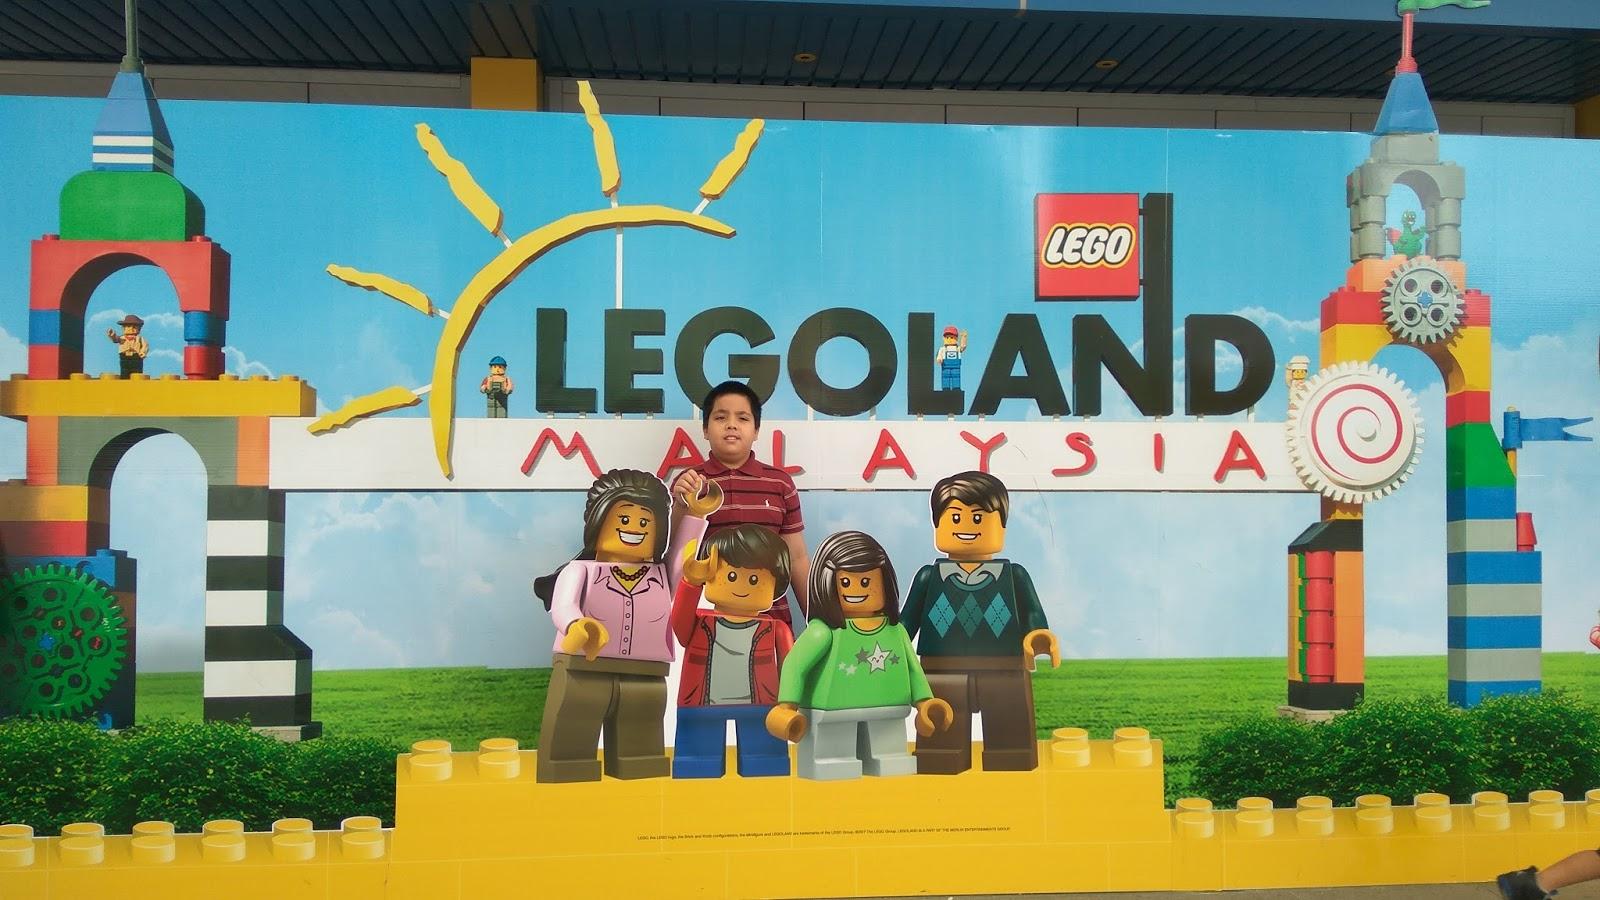 Legoland Theme Park Malaysia Cerita Ceriti Ceritu Mamapipie Tiket 01 Day Combo Water Anak 3 11 Img 20170930 124616